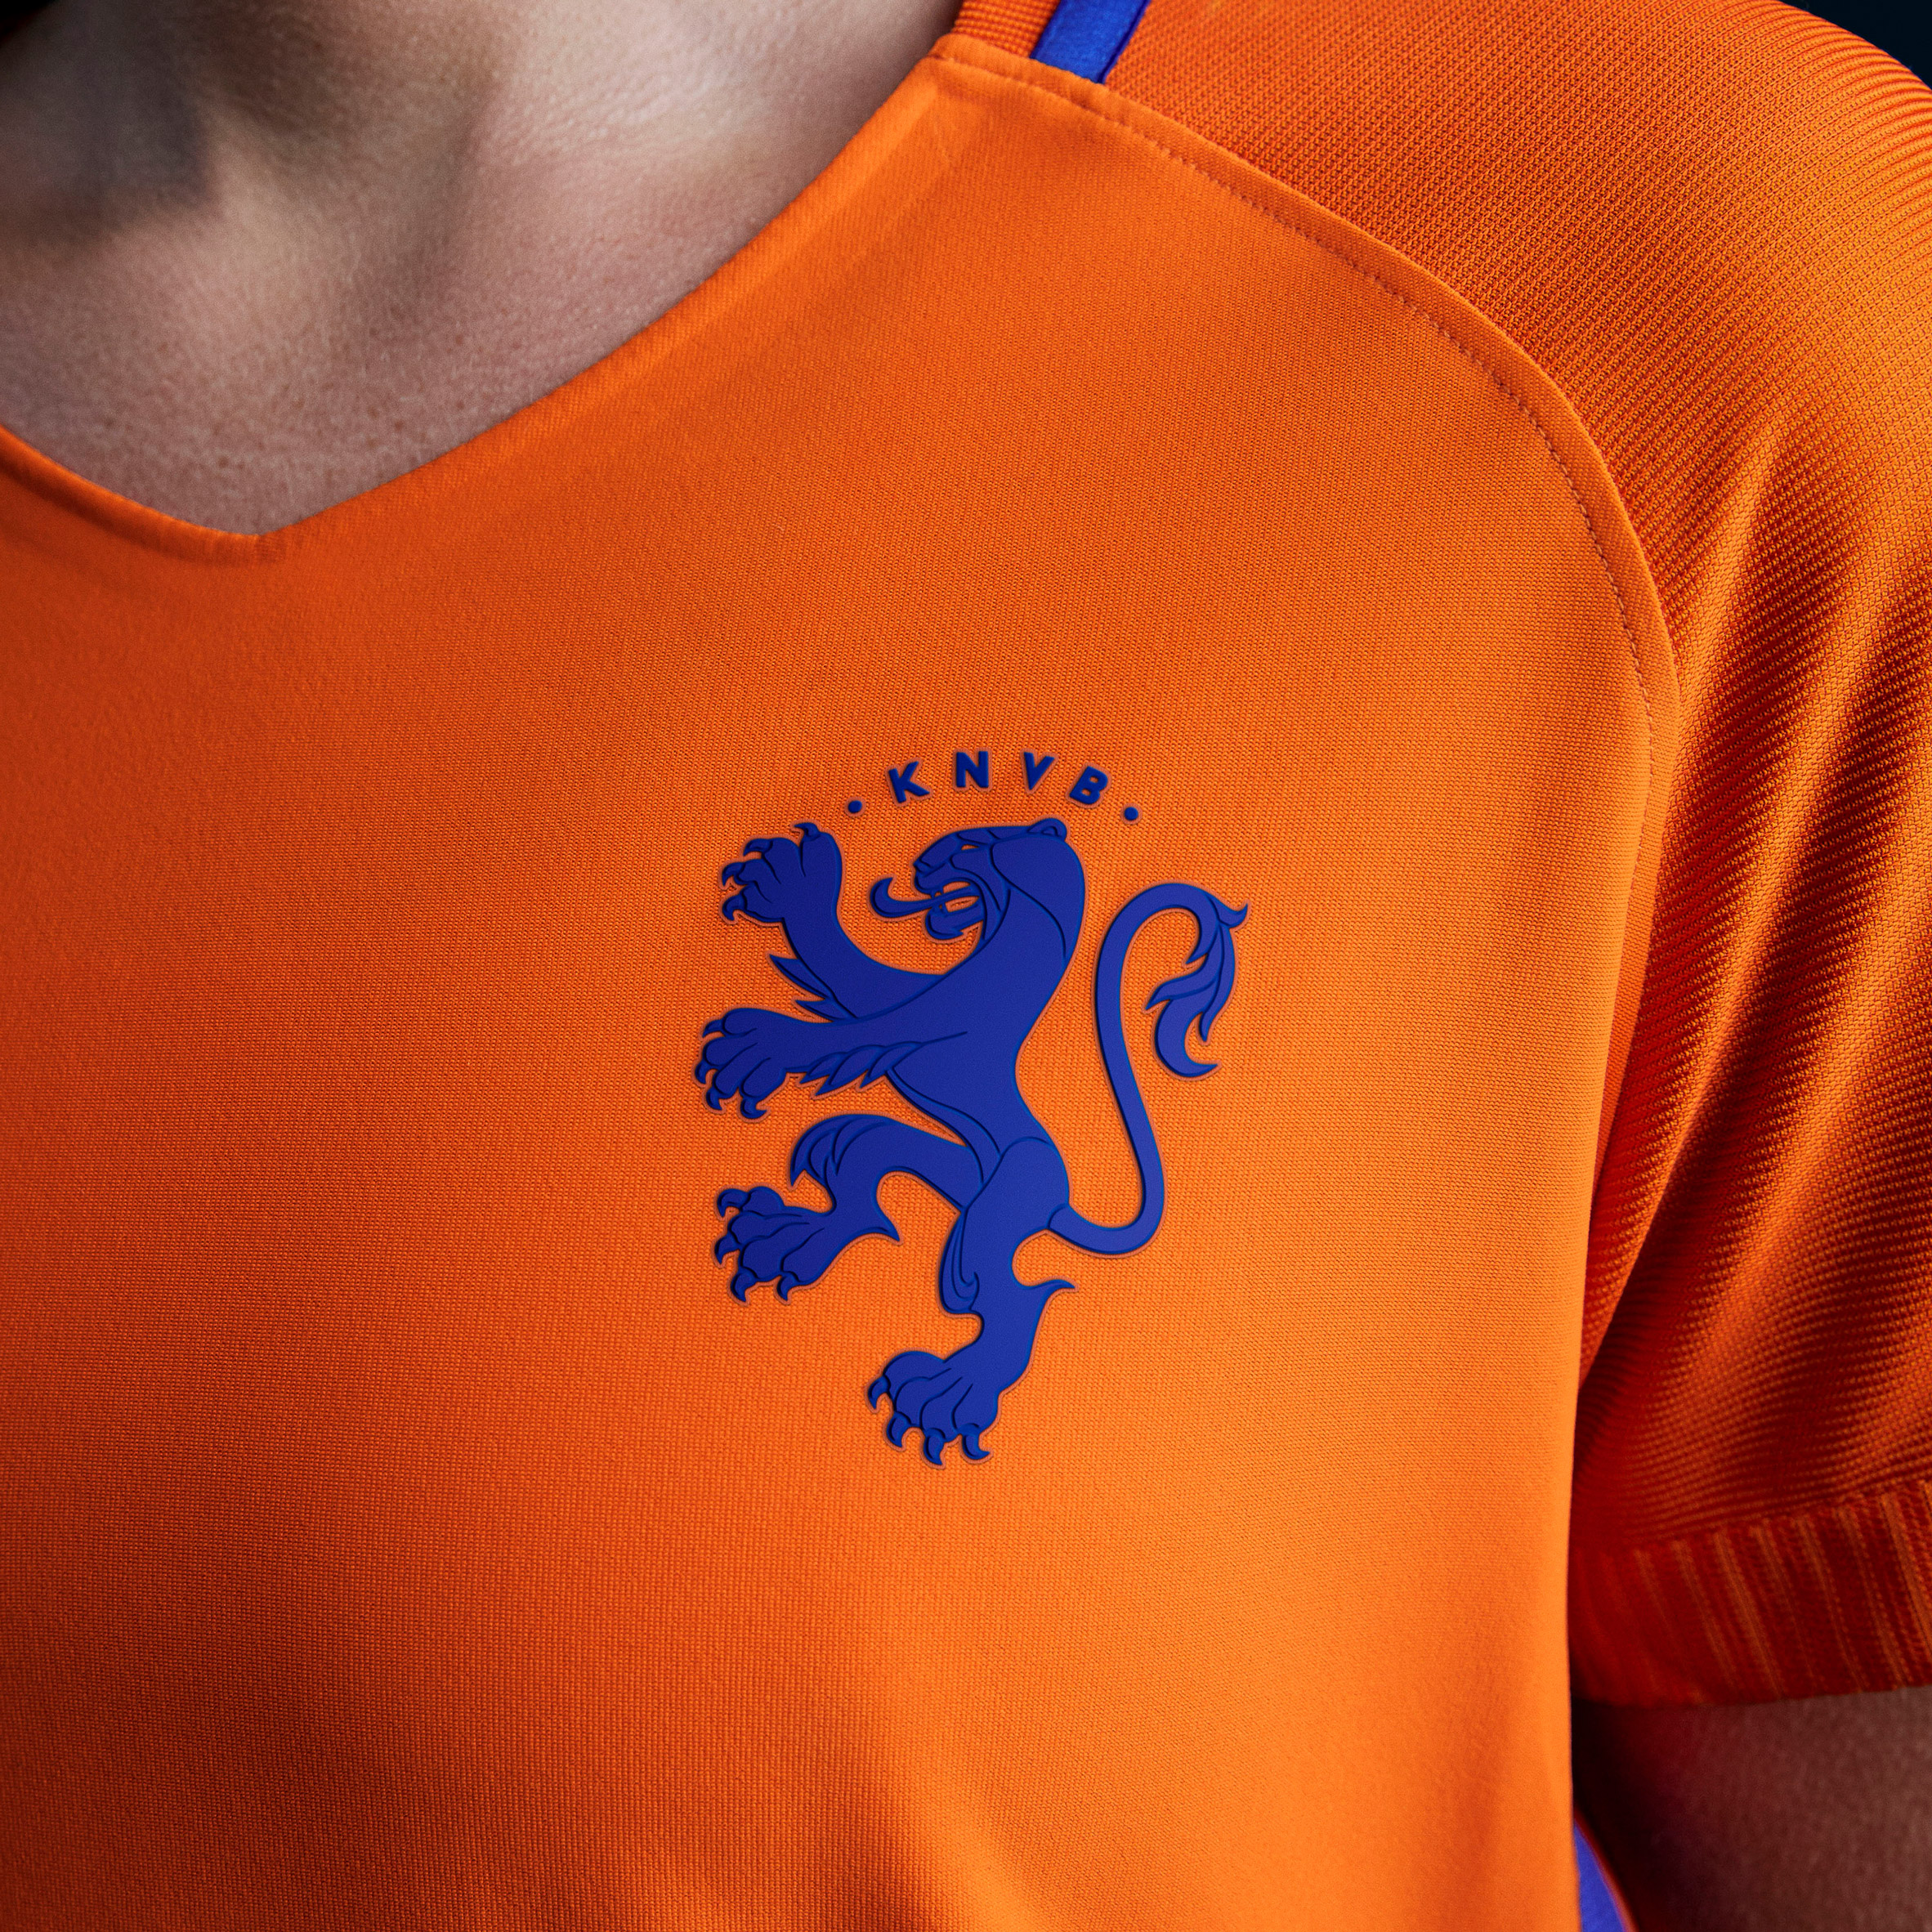 b04db80b Lion crest on Dutch national football kits has sex change for ...